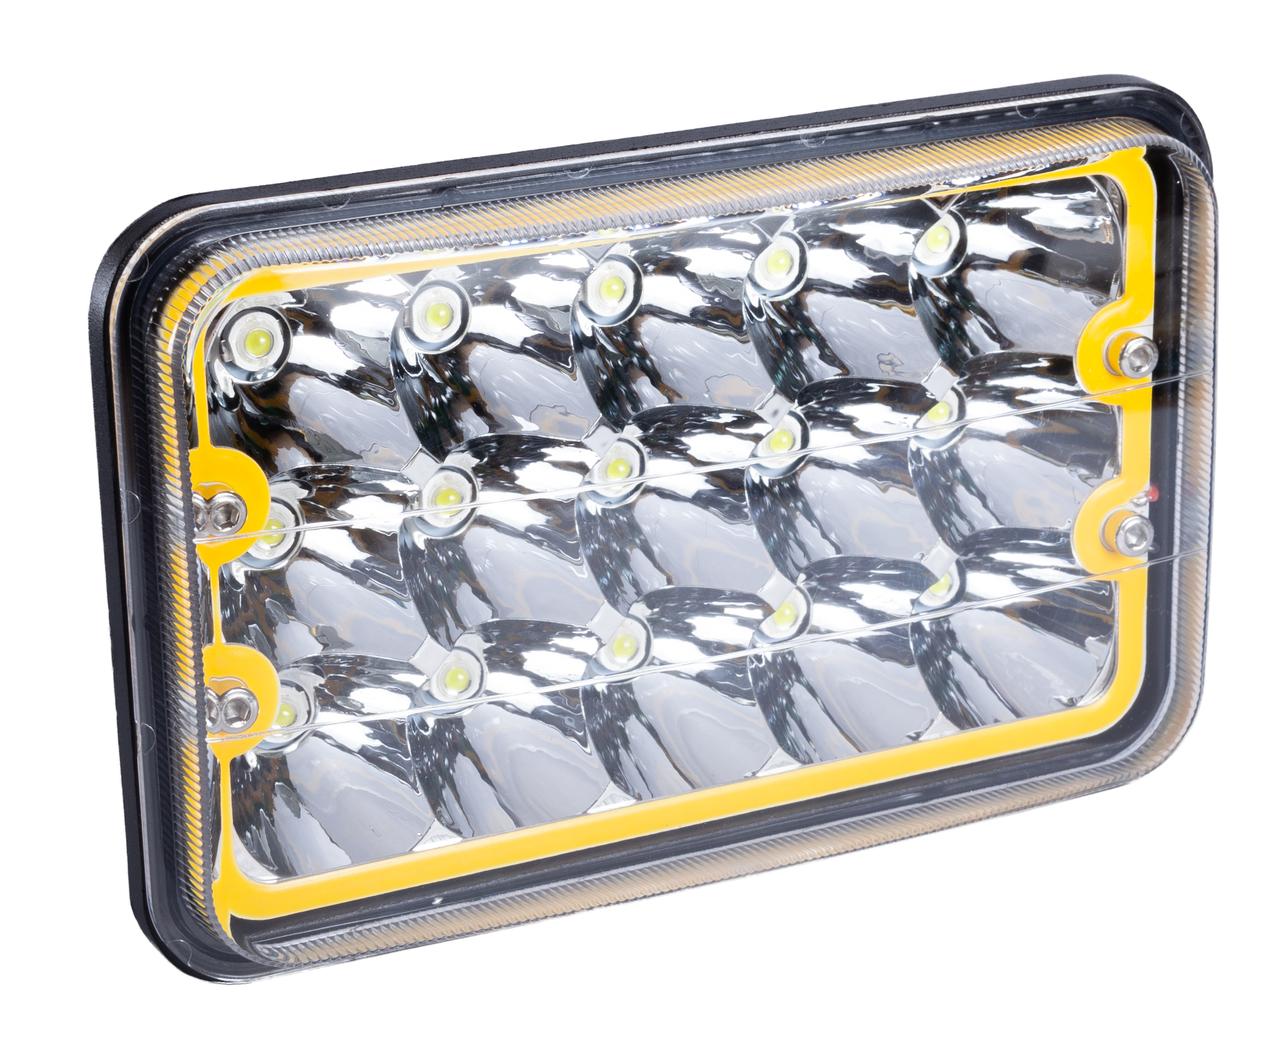 Фара LED прямоугольная 45W (15 диодов) (ближн. + дальний) (+ LED кольцо белое)